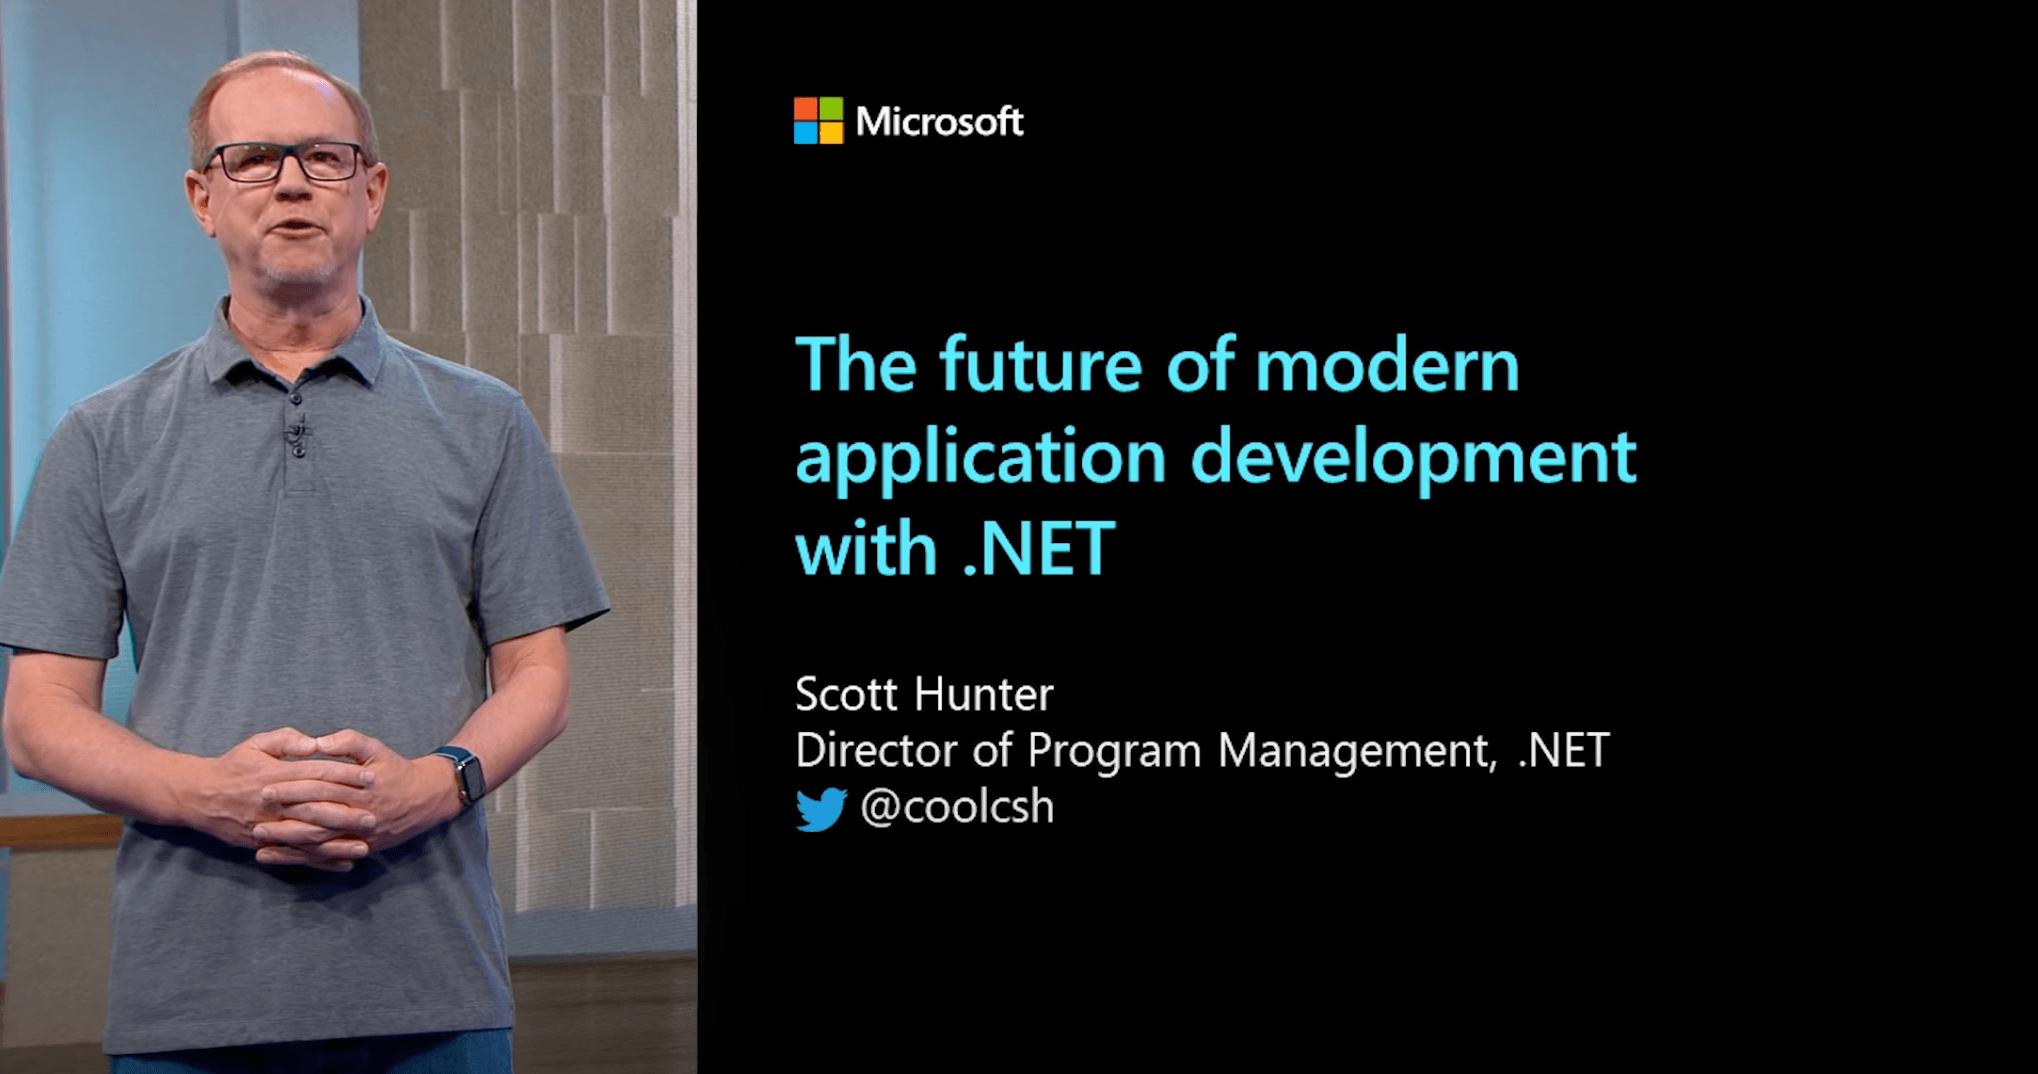 Scott Hunter giving DotNet Talk, The future of modern application development with .NET